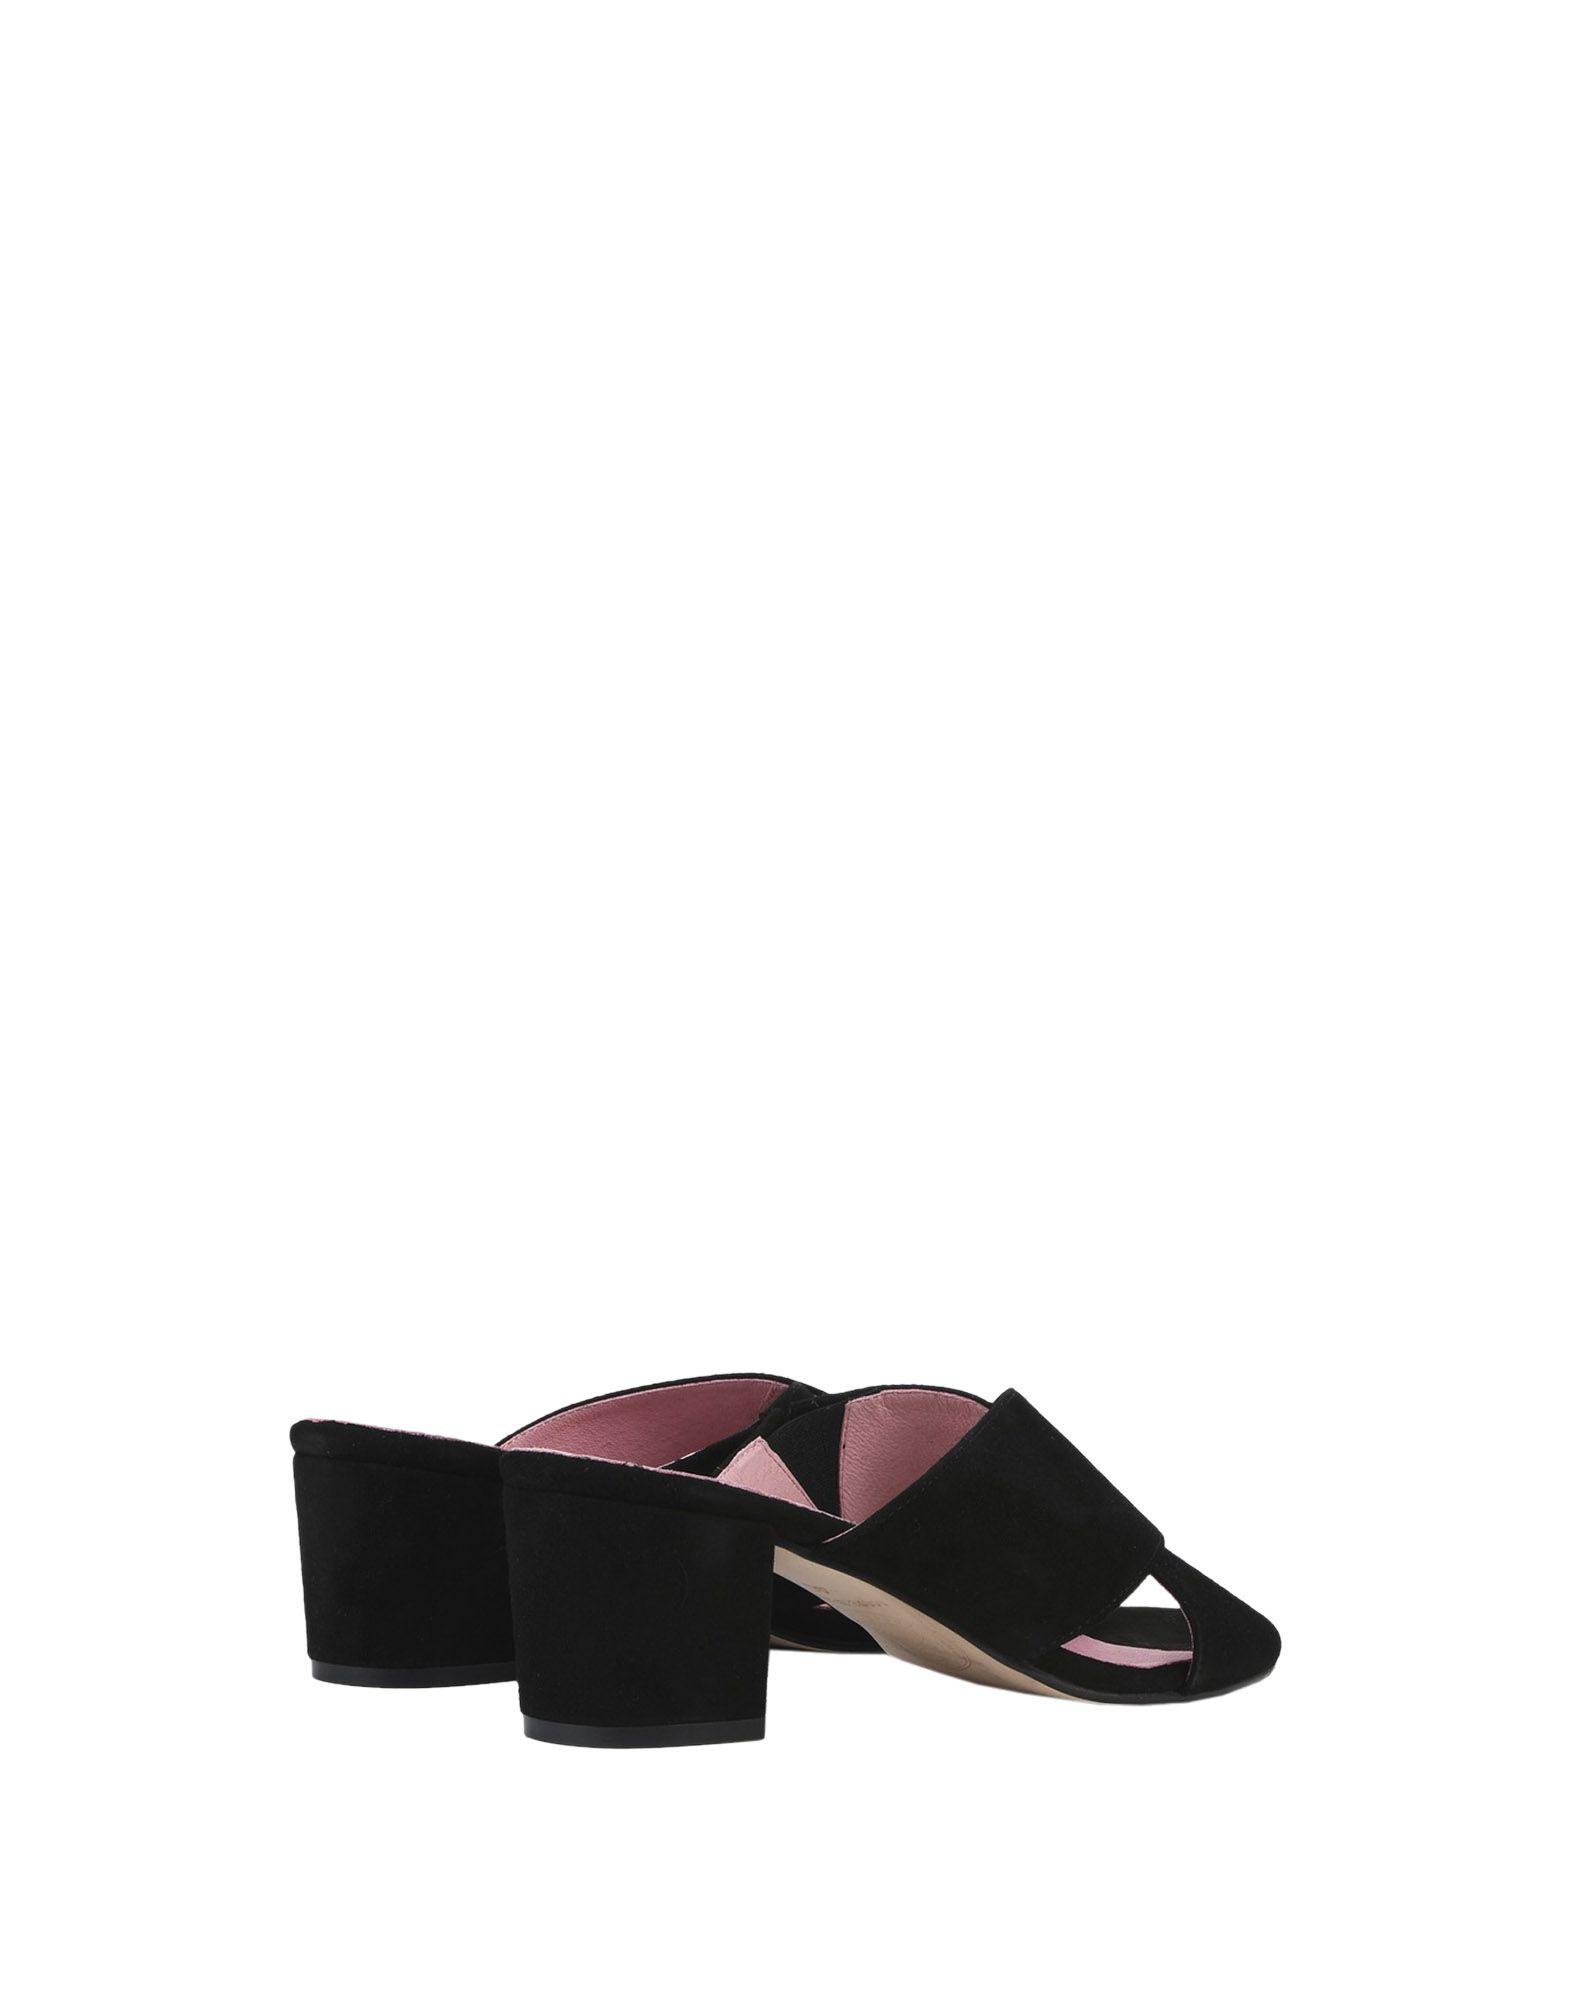 Sandales Maison Shoeshibar Koto - Femme - Sandales Maison Shoeshibar sur